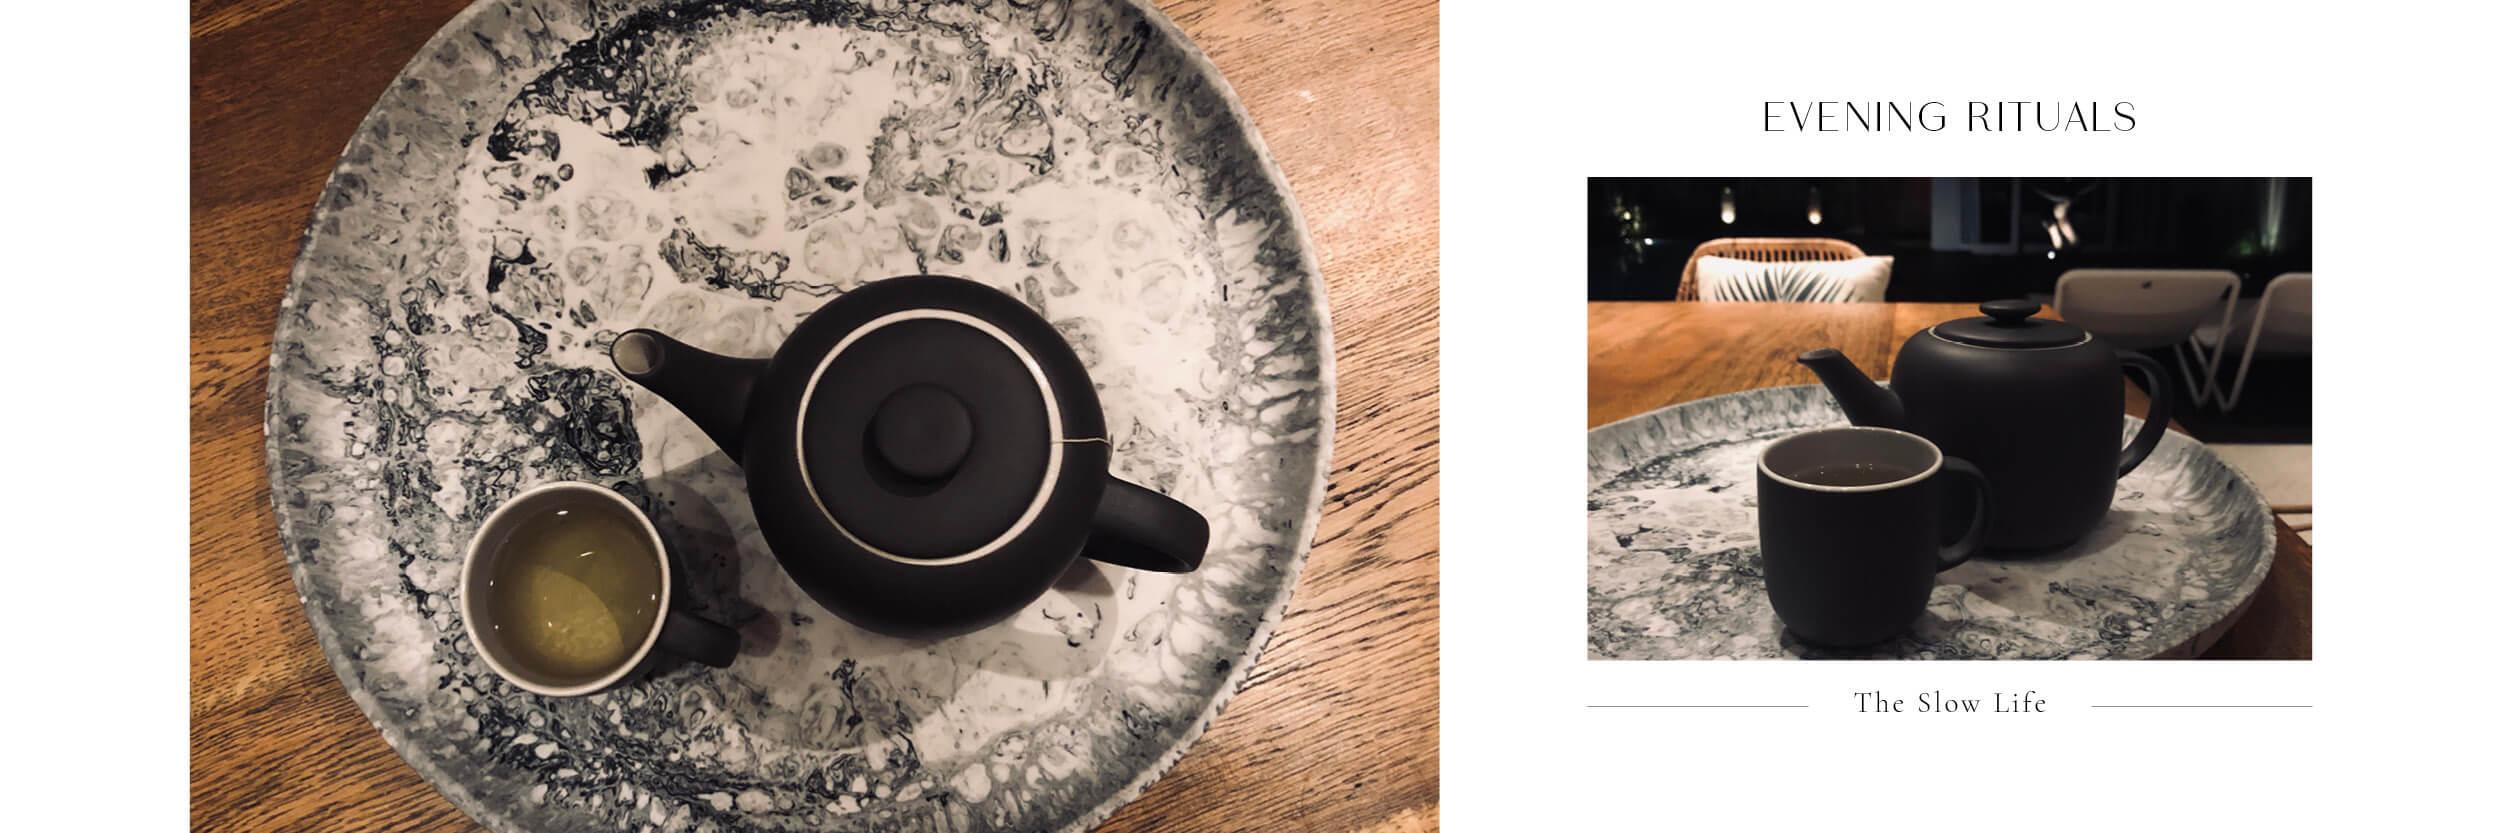 TWENTYTWONOTES Travel Notes_Origin Seminyak Evening Tea